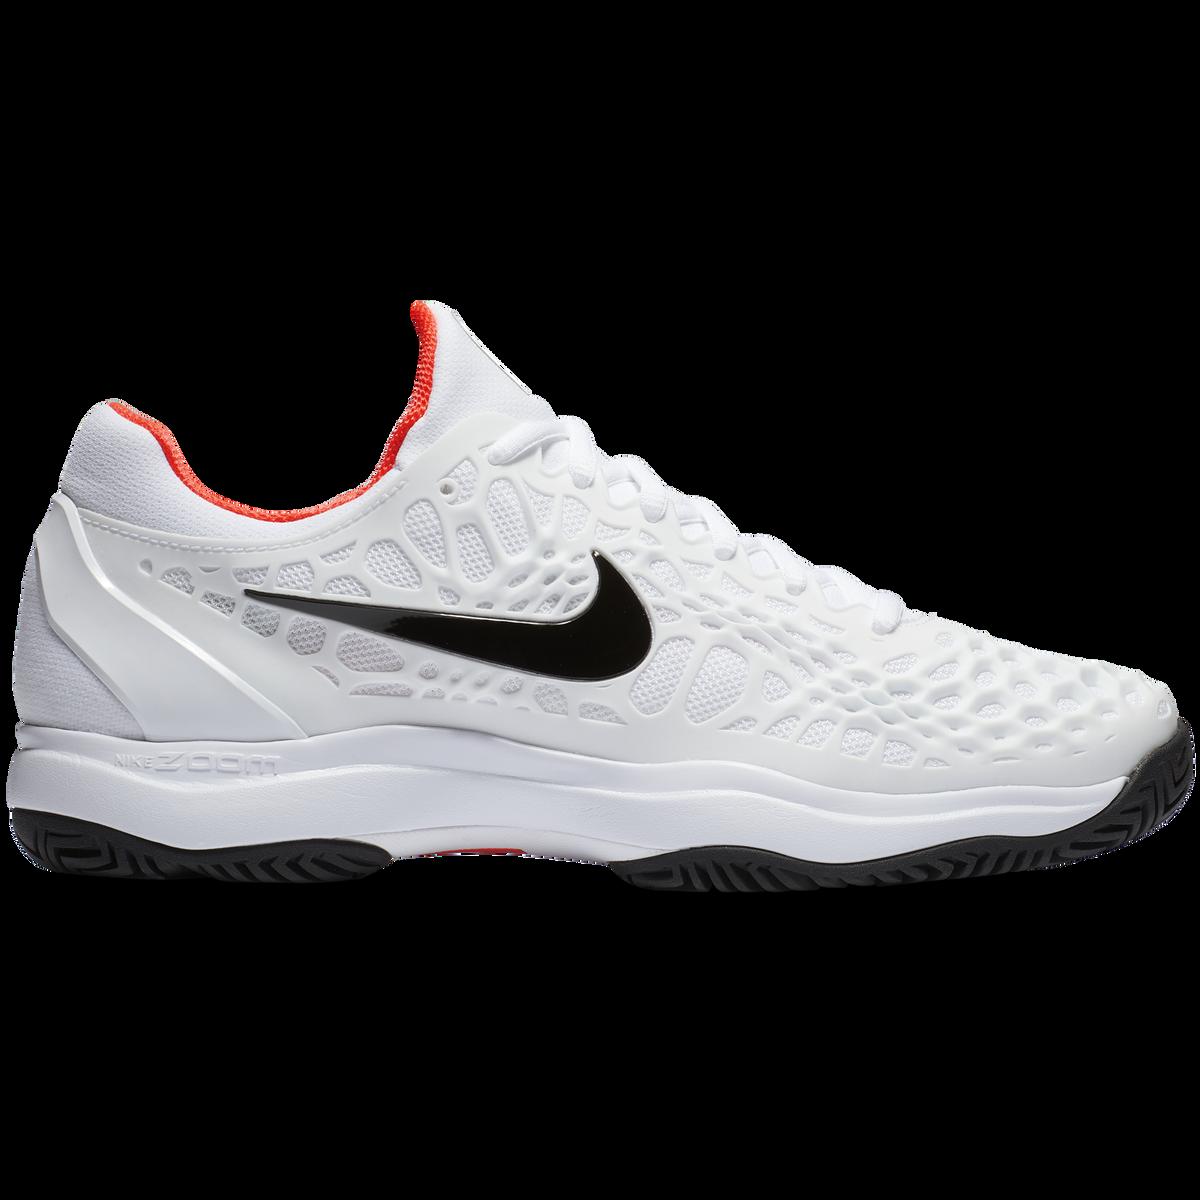 Images. Zoom Cage 3 Men  39 s Tennis Shoe - White Black Red b511c6707